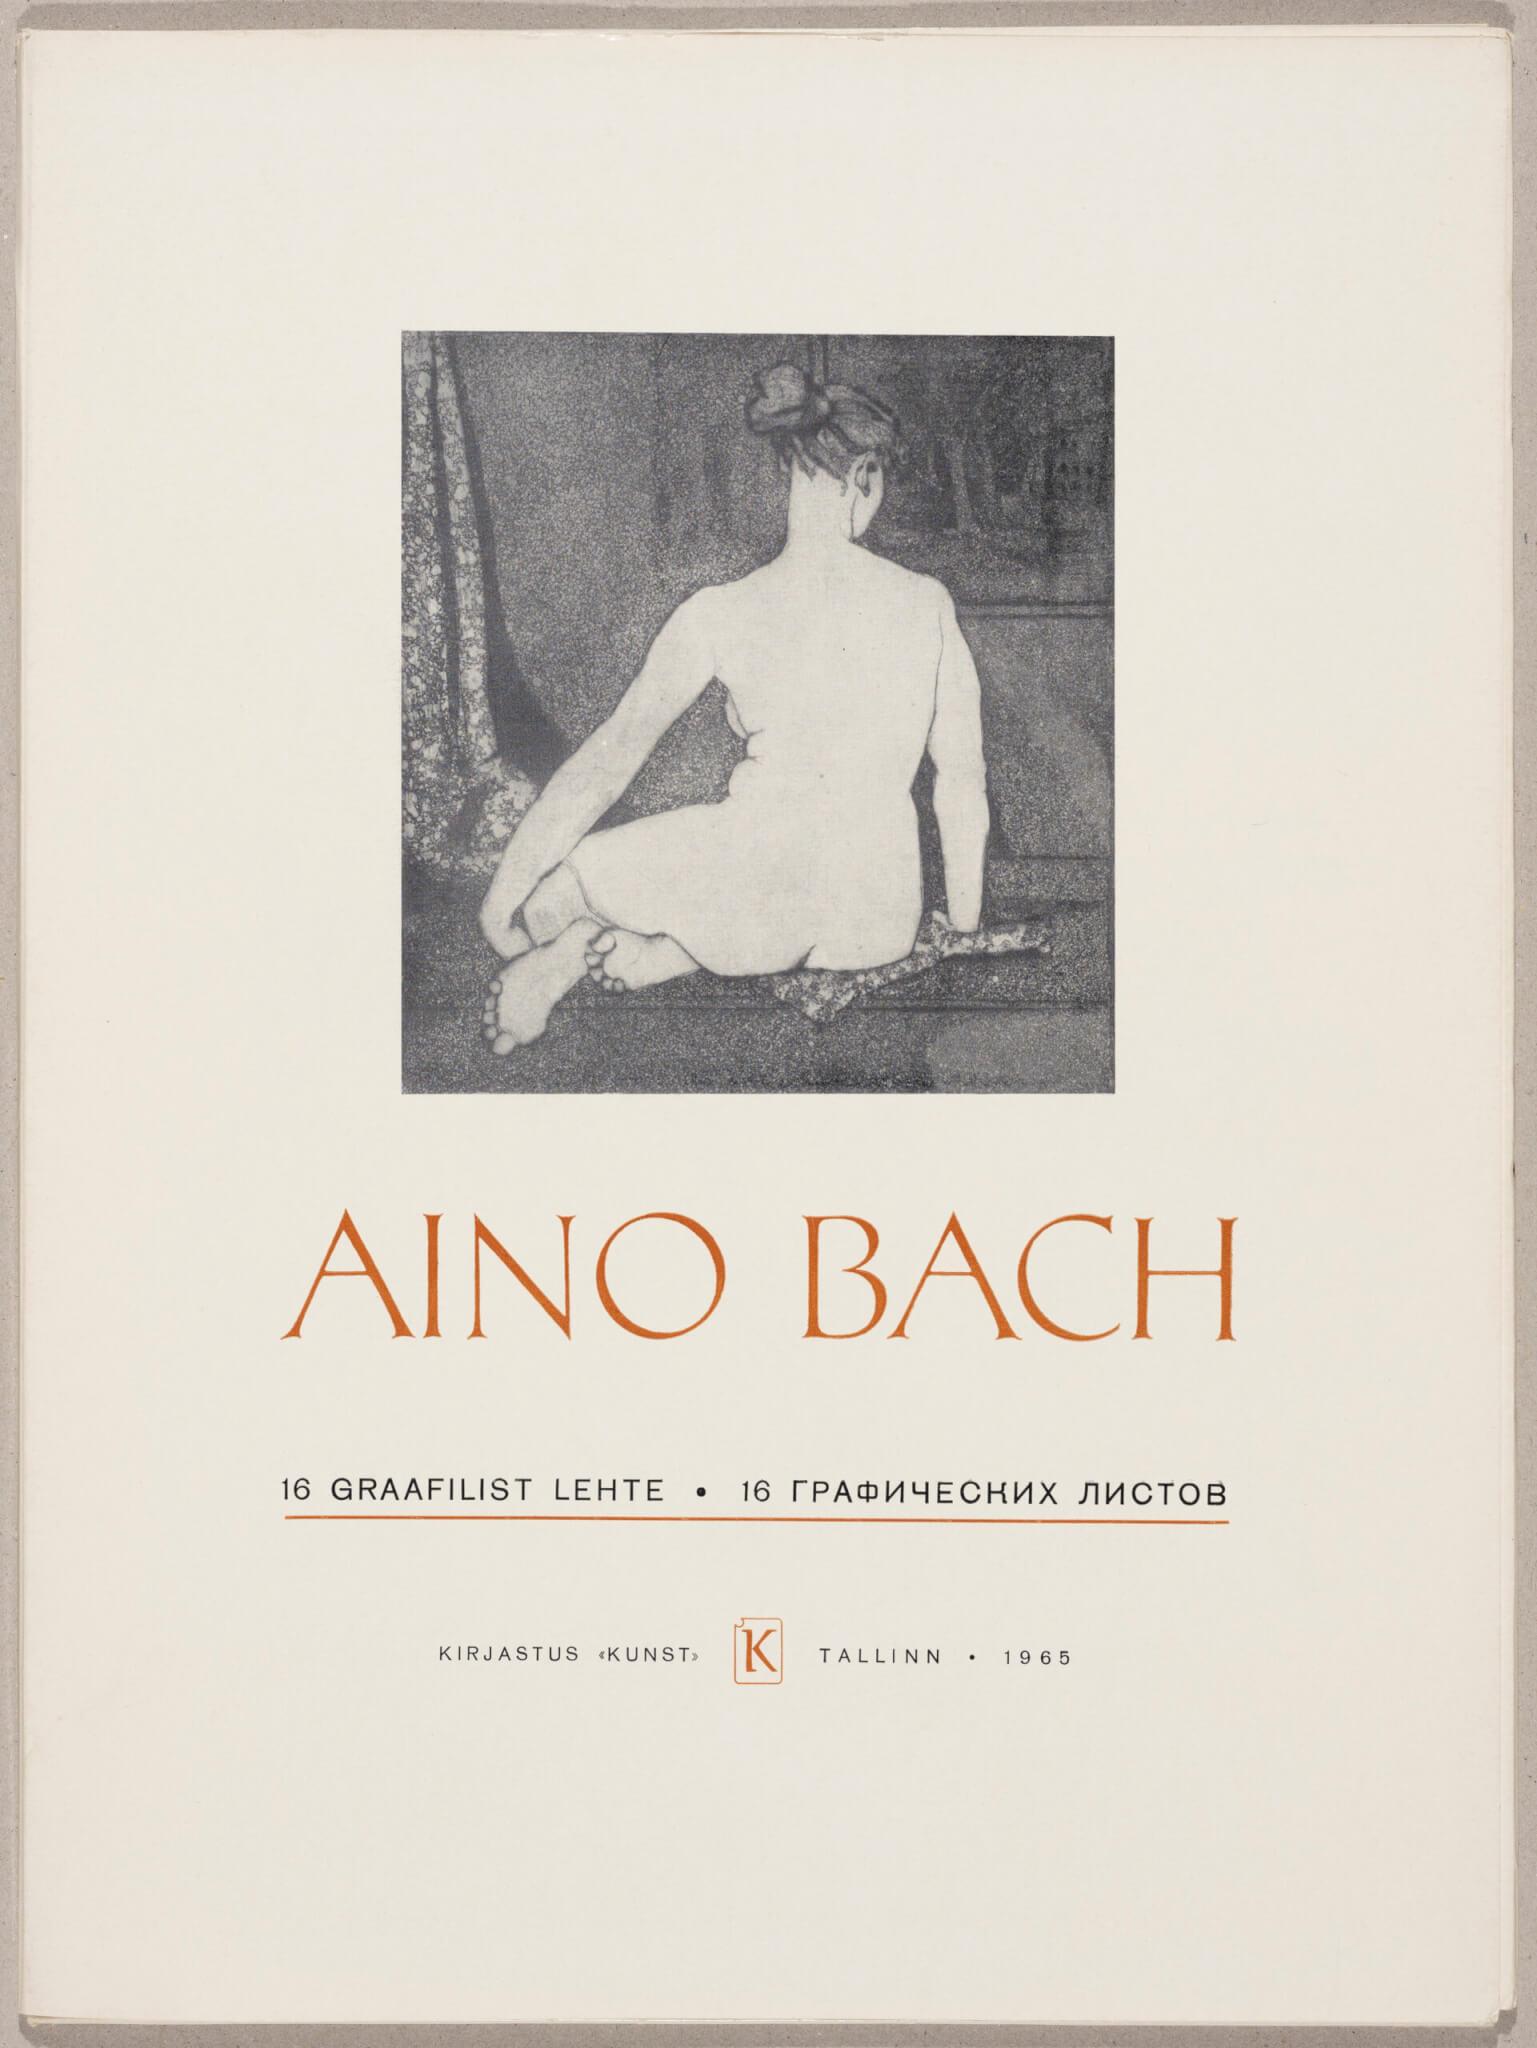 Aino-Bach-teoste-kogumik